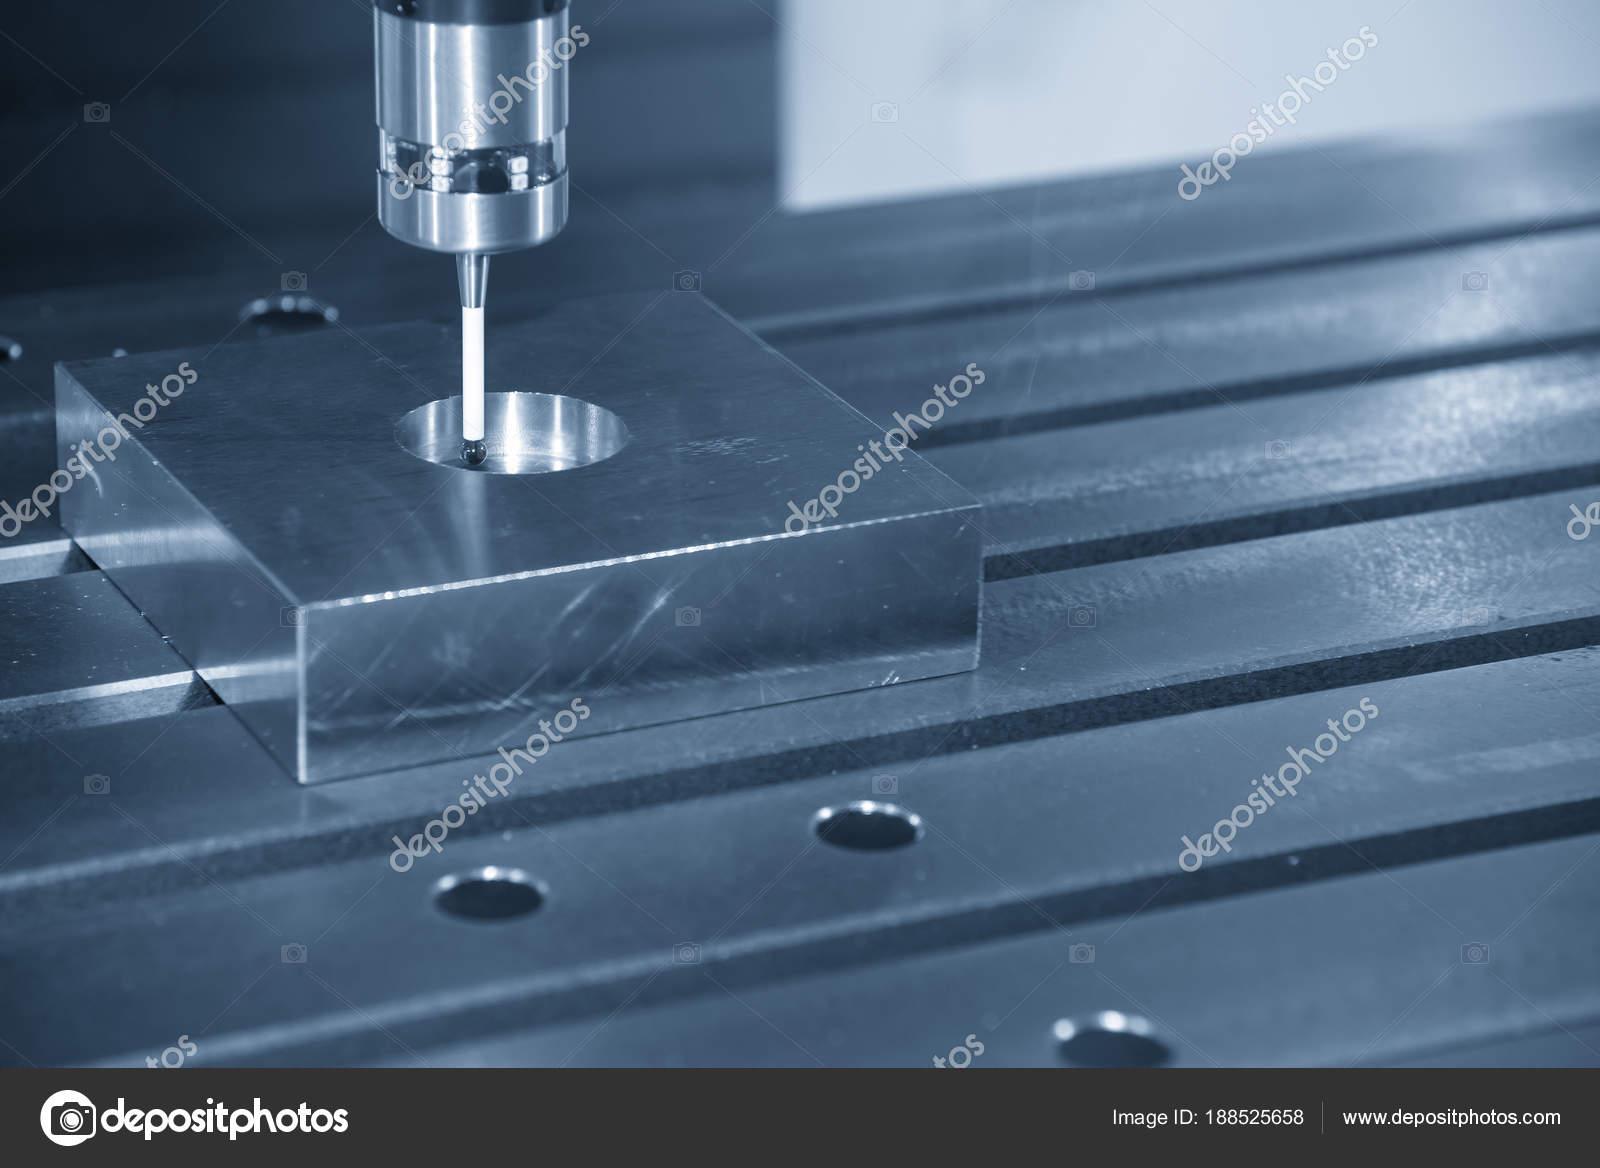 The CNC machine attach the CMM probe measure the dimension of ci ...